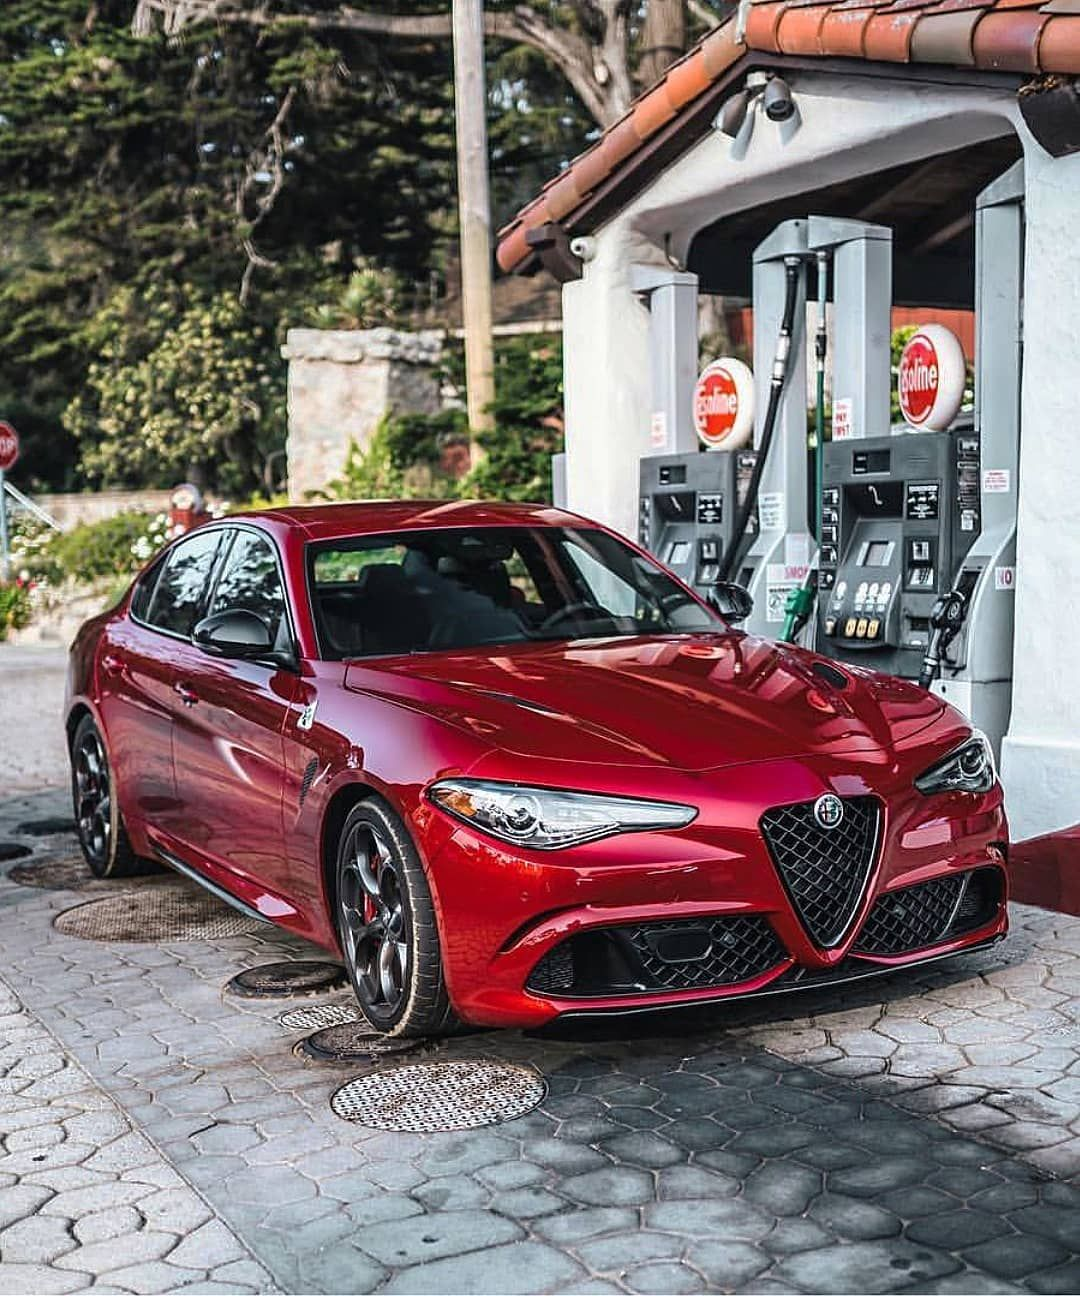 Alfa Romeo Qv On Instagram You Know She Loves To Drink Alfa Romeo Giulia Quadrifoglio P Alfa Romeo Alfa Romeo Giulia Quadrifoglio Alfa Romeo Giulia